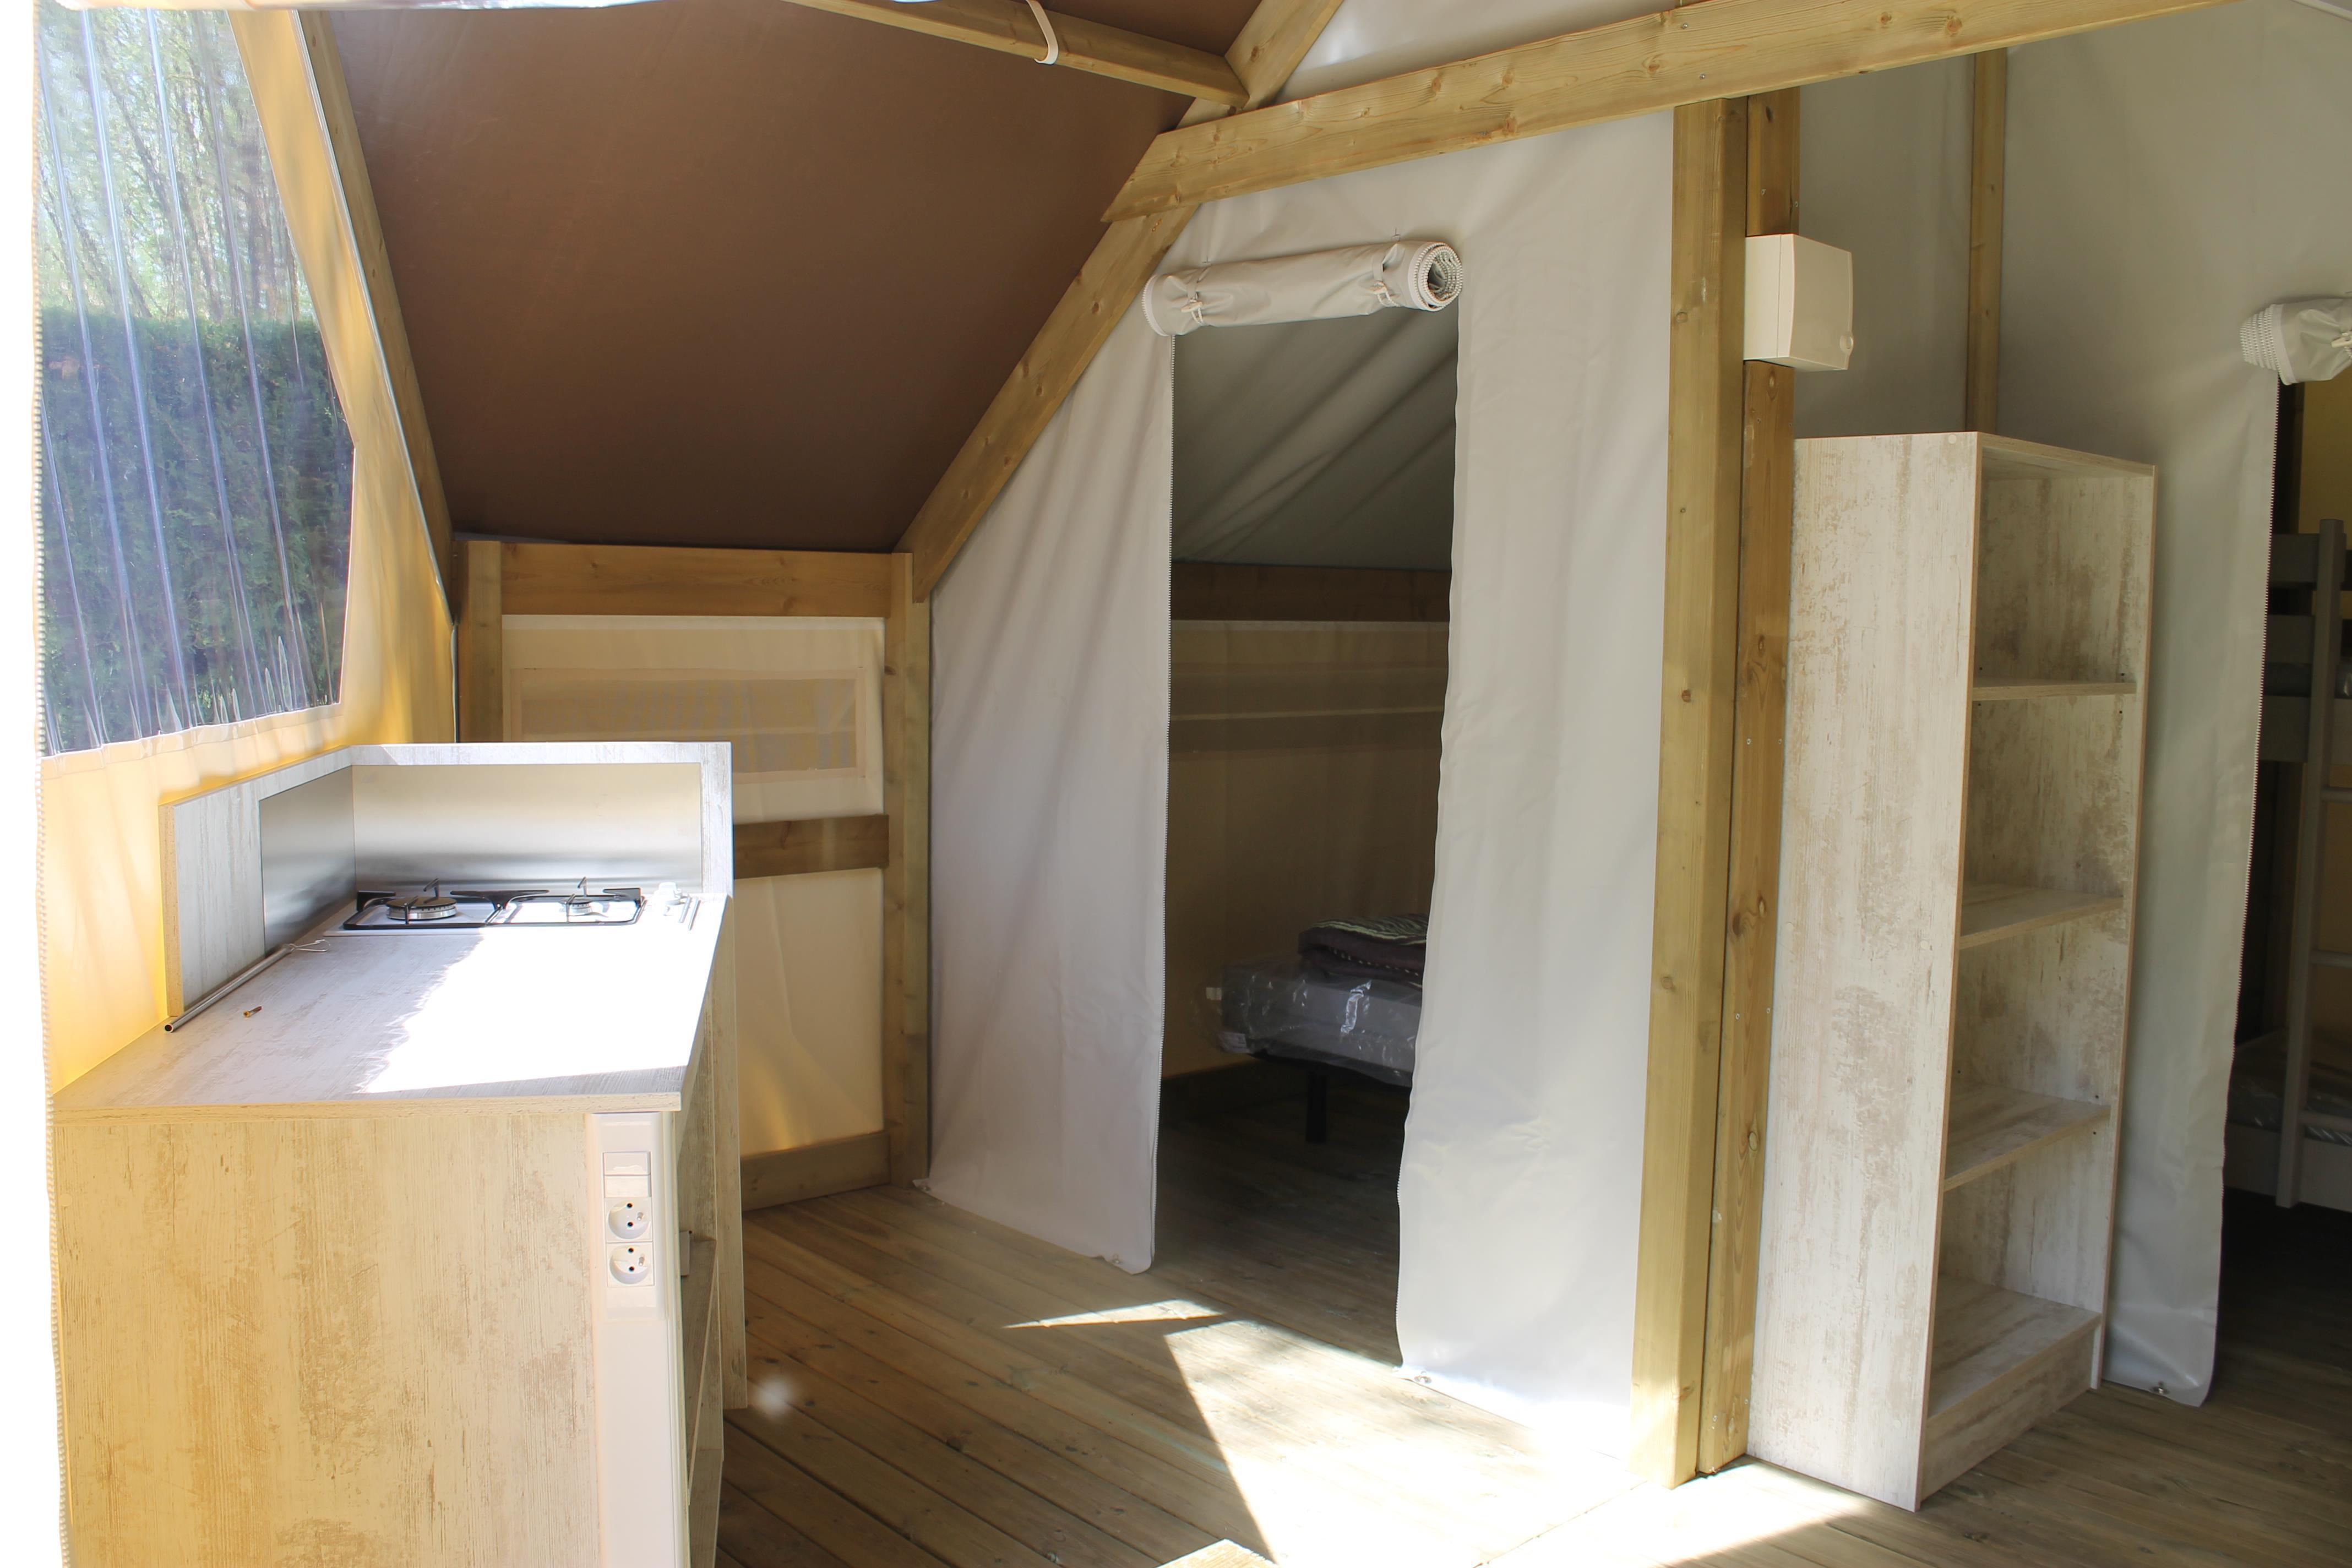 Location - Ecolodge Toilé Confort + 21M² - 2 Chambres - Flower Camping La Riviere